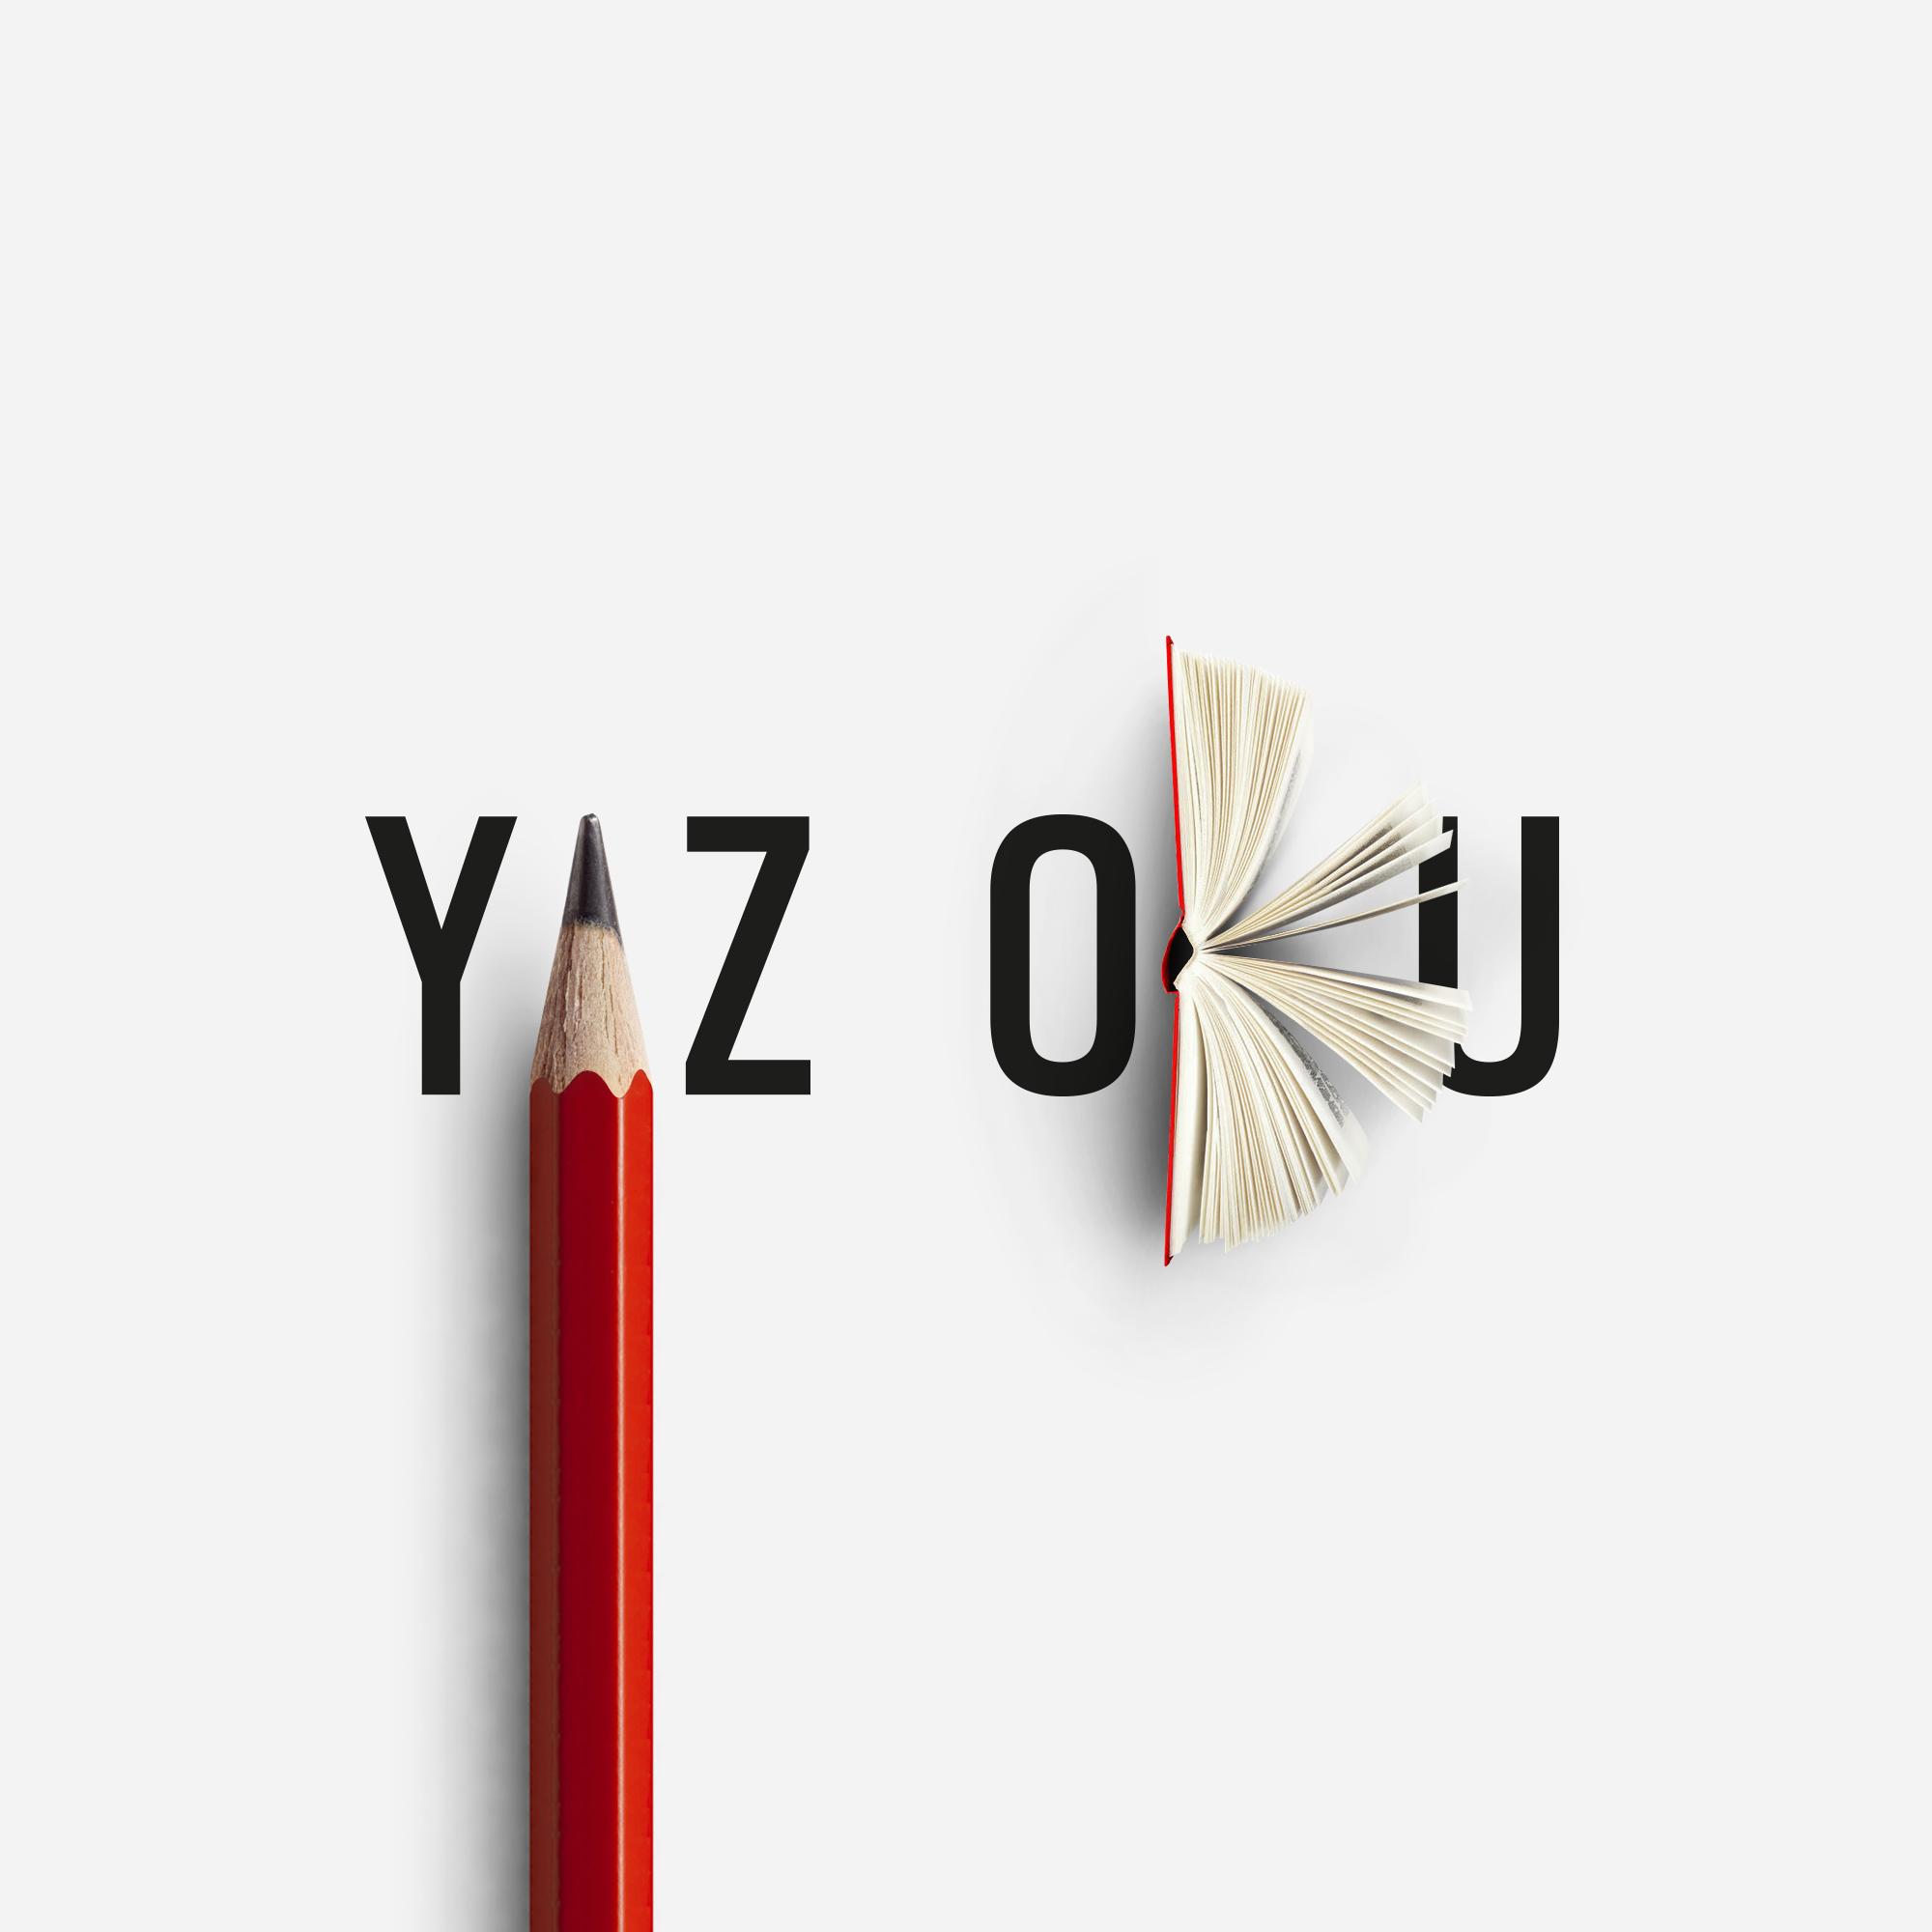 Yaz Oku Digital Platform Branding Designed by Paper Brand Identity